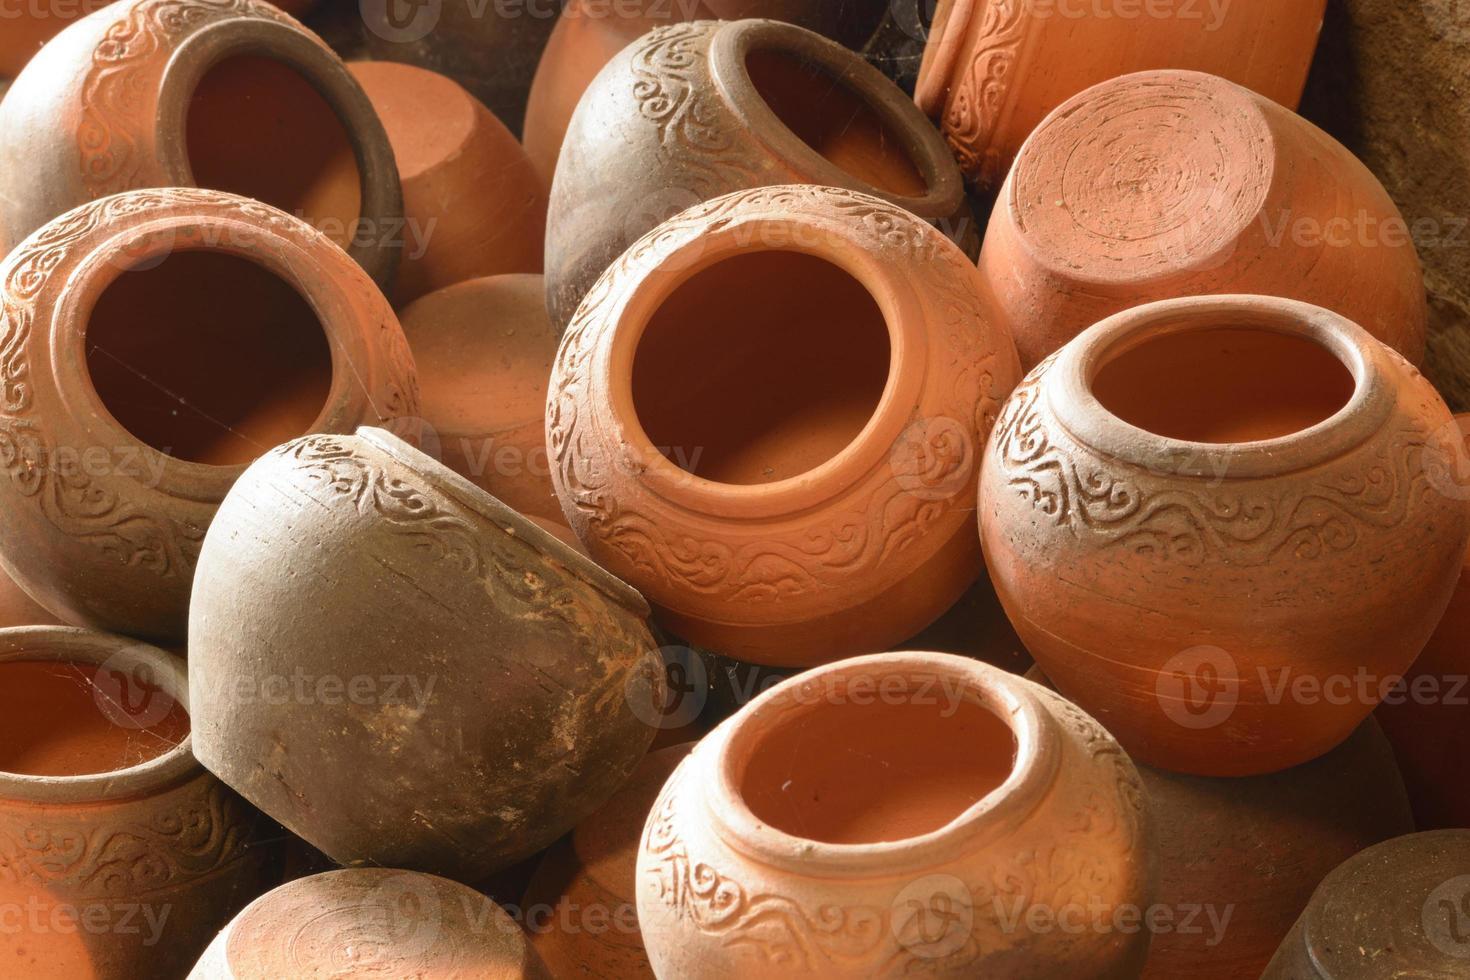 Handwerk Keramik Ton Tasse foto